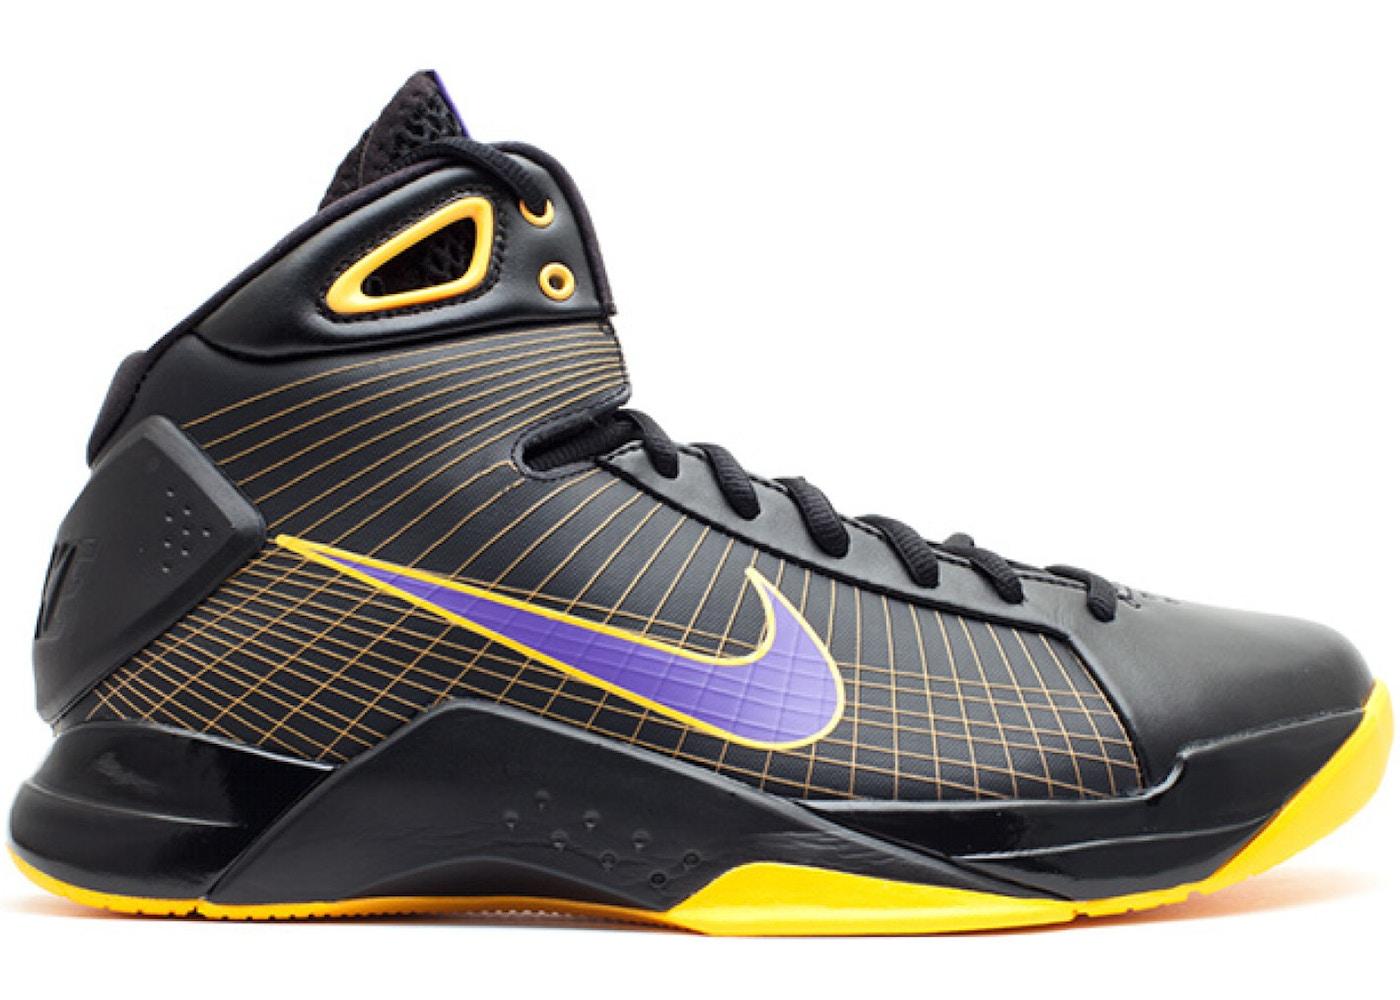 online store 9099c 03116 Nike Hyperdunk Kobe Away - 333373-051